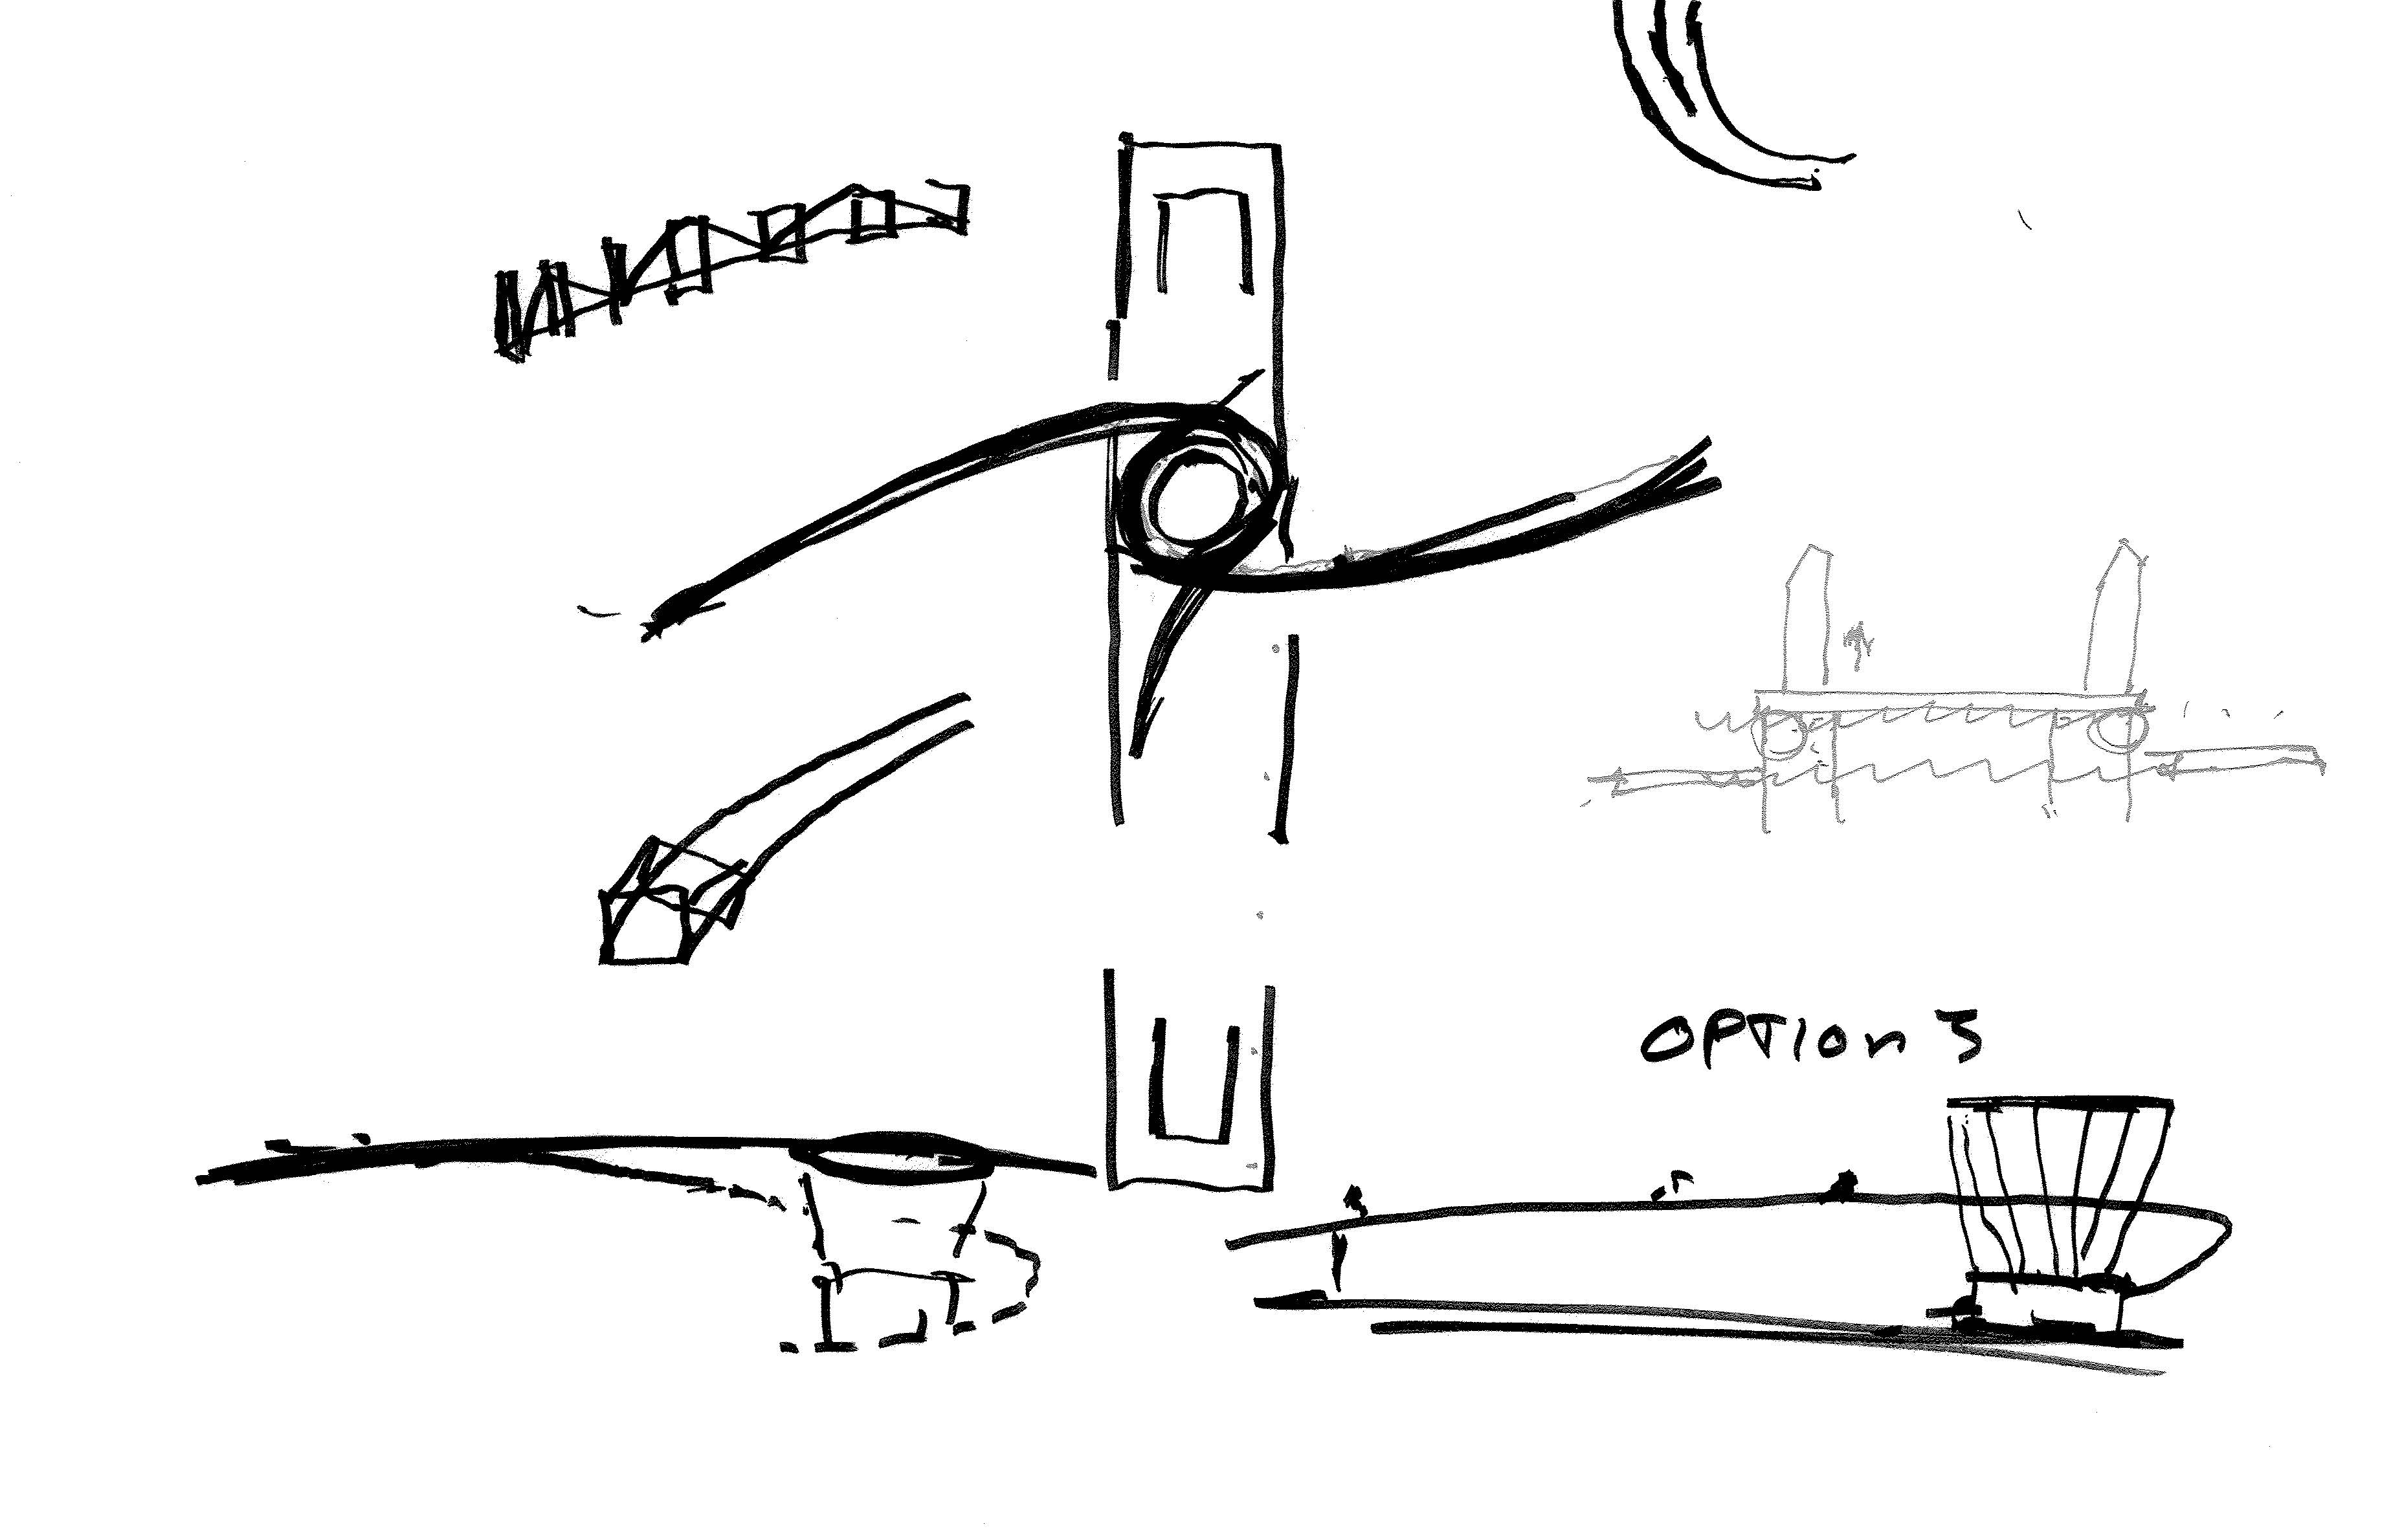 NABC_Sketch-5